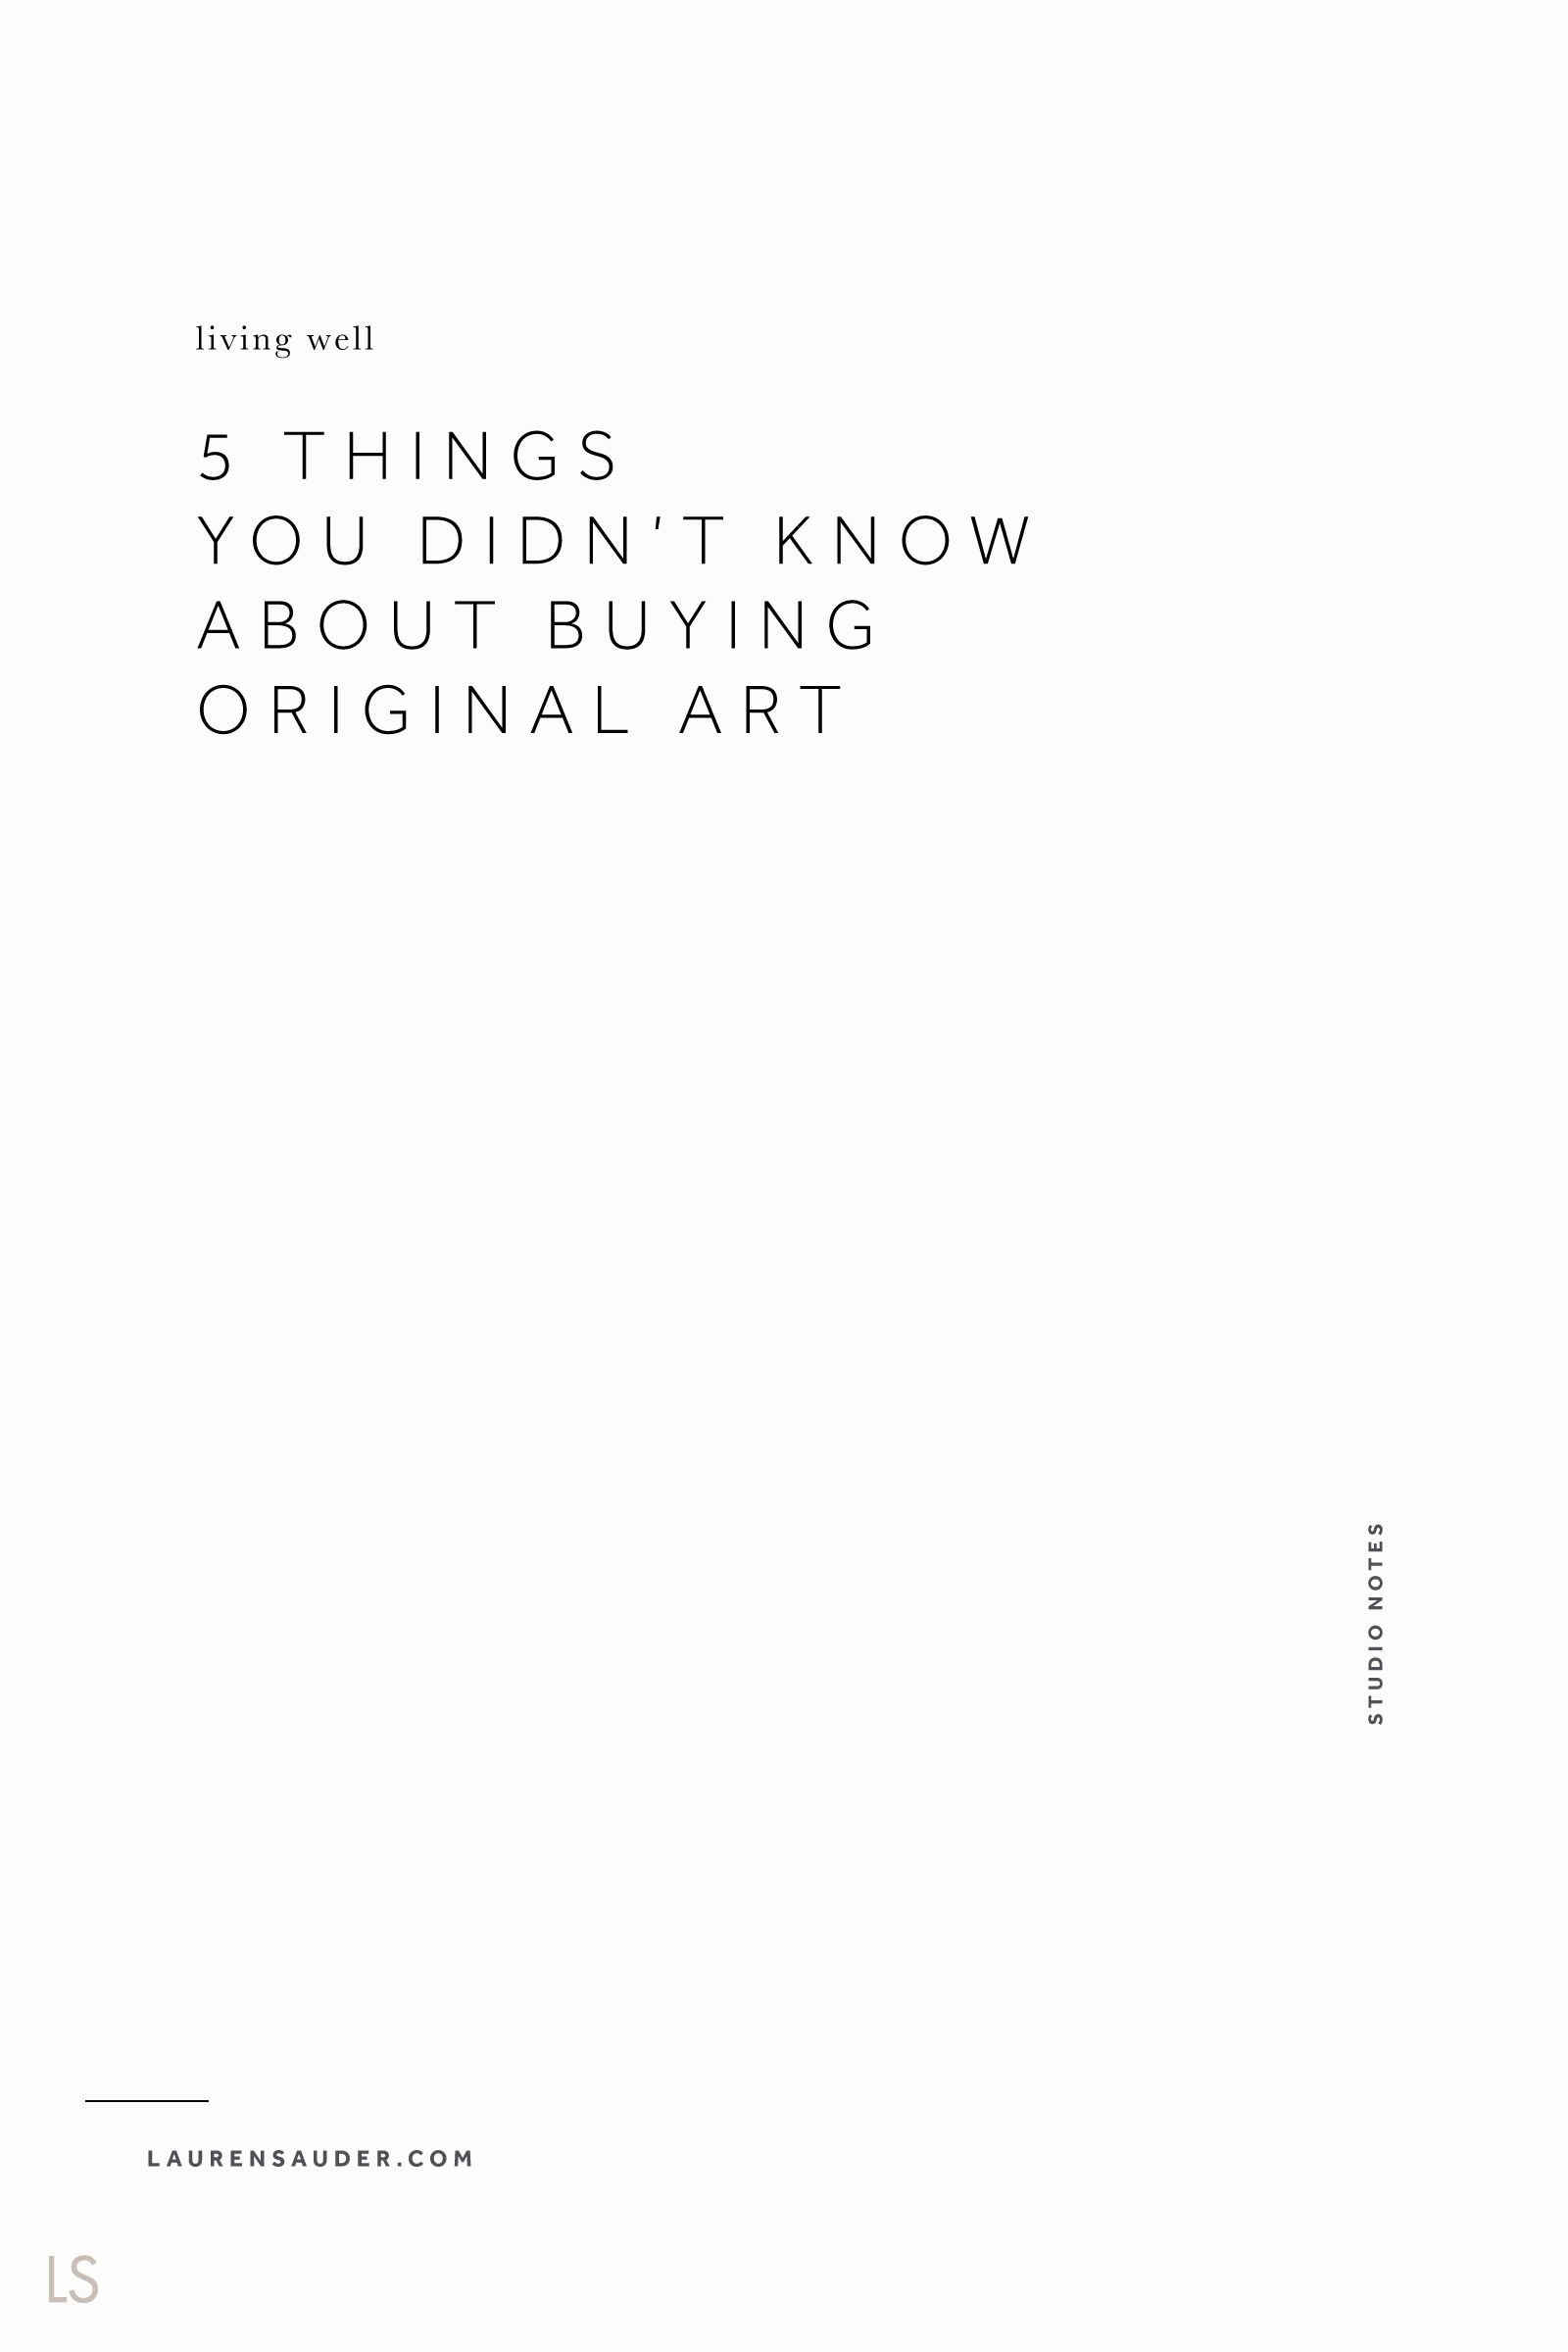 5 Things You Didn't Know About Buying Original Art - Lauren Sauder art, original art, art piece, hanging artwork, gallery wall, art collector, intentional living